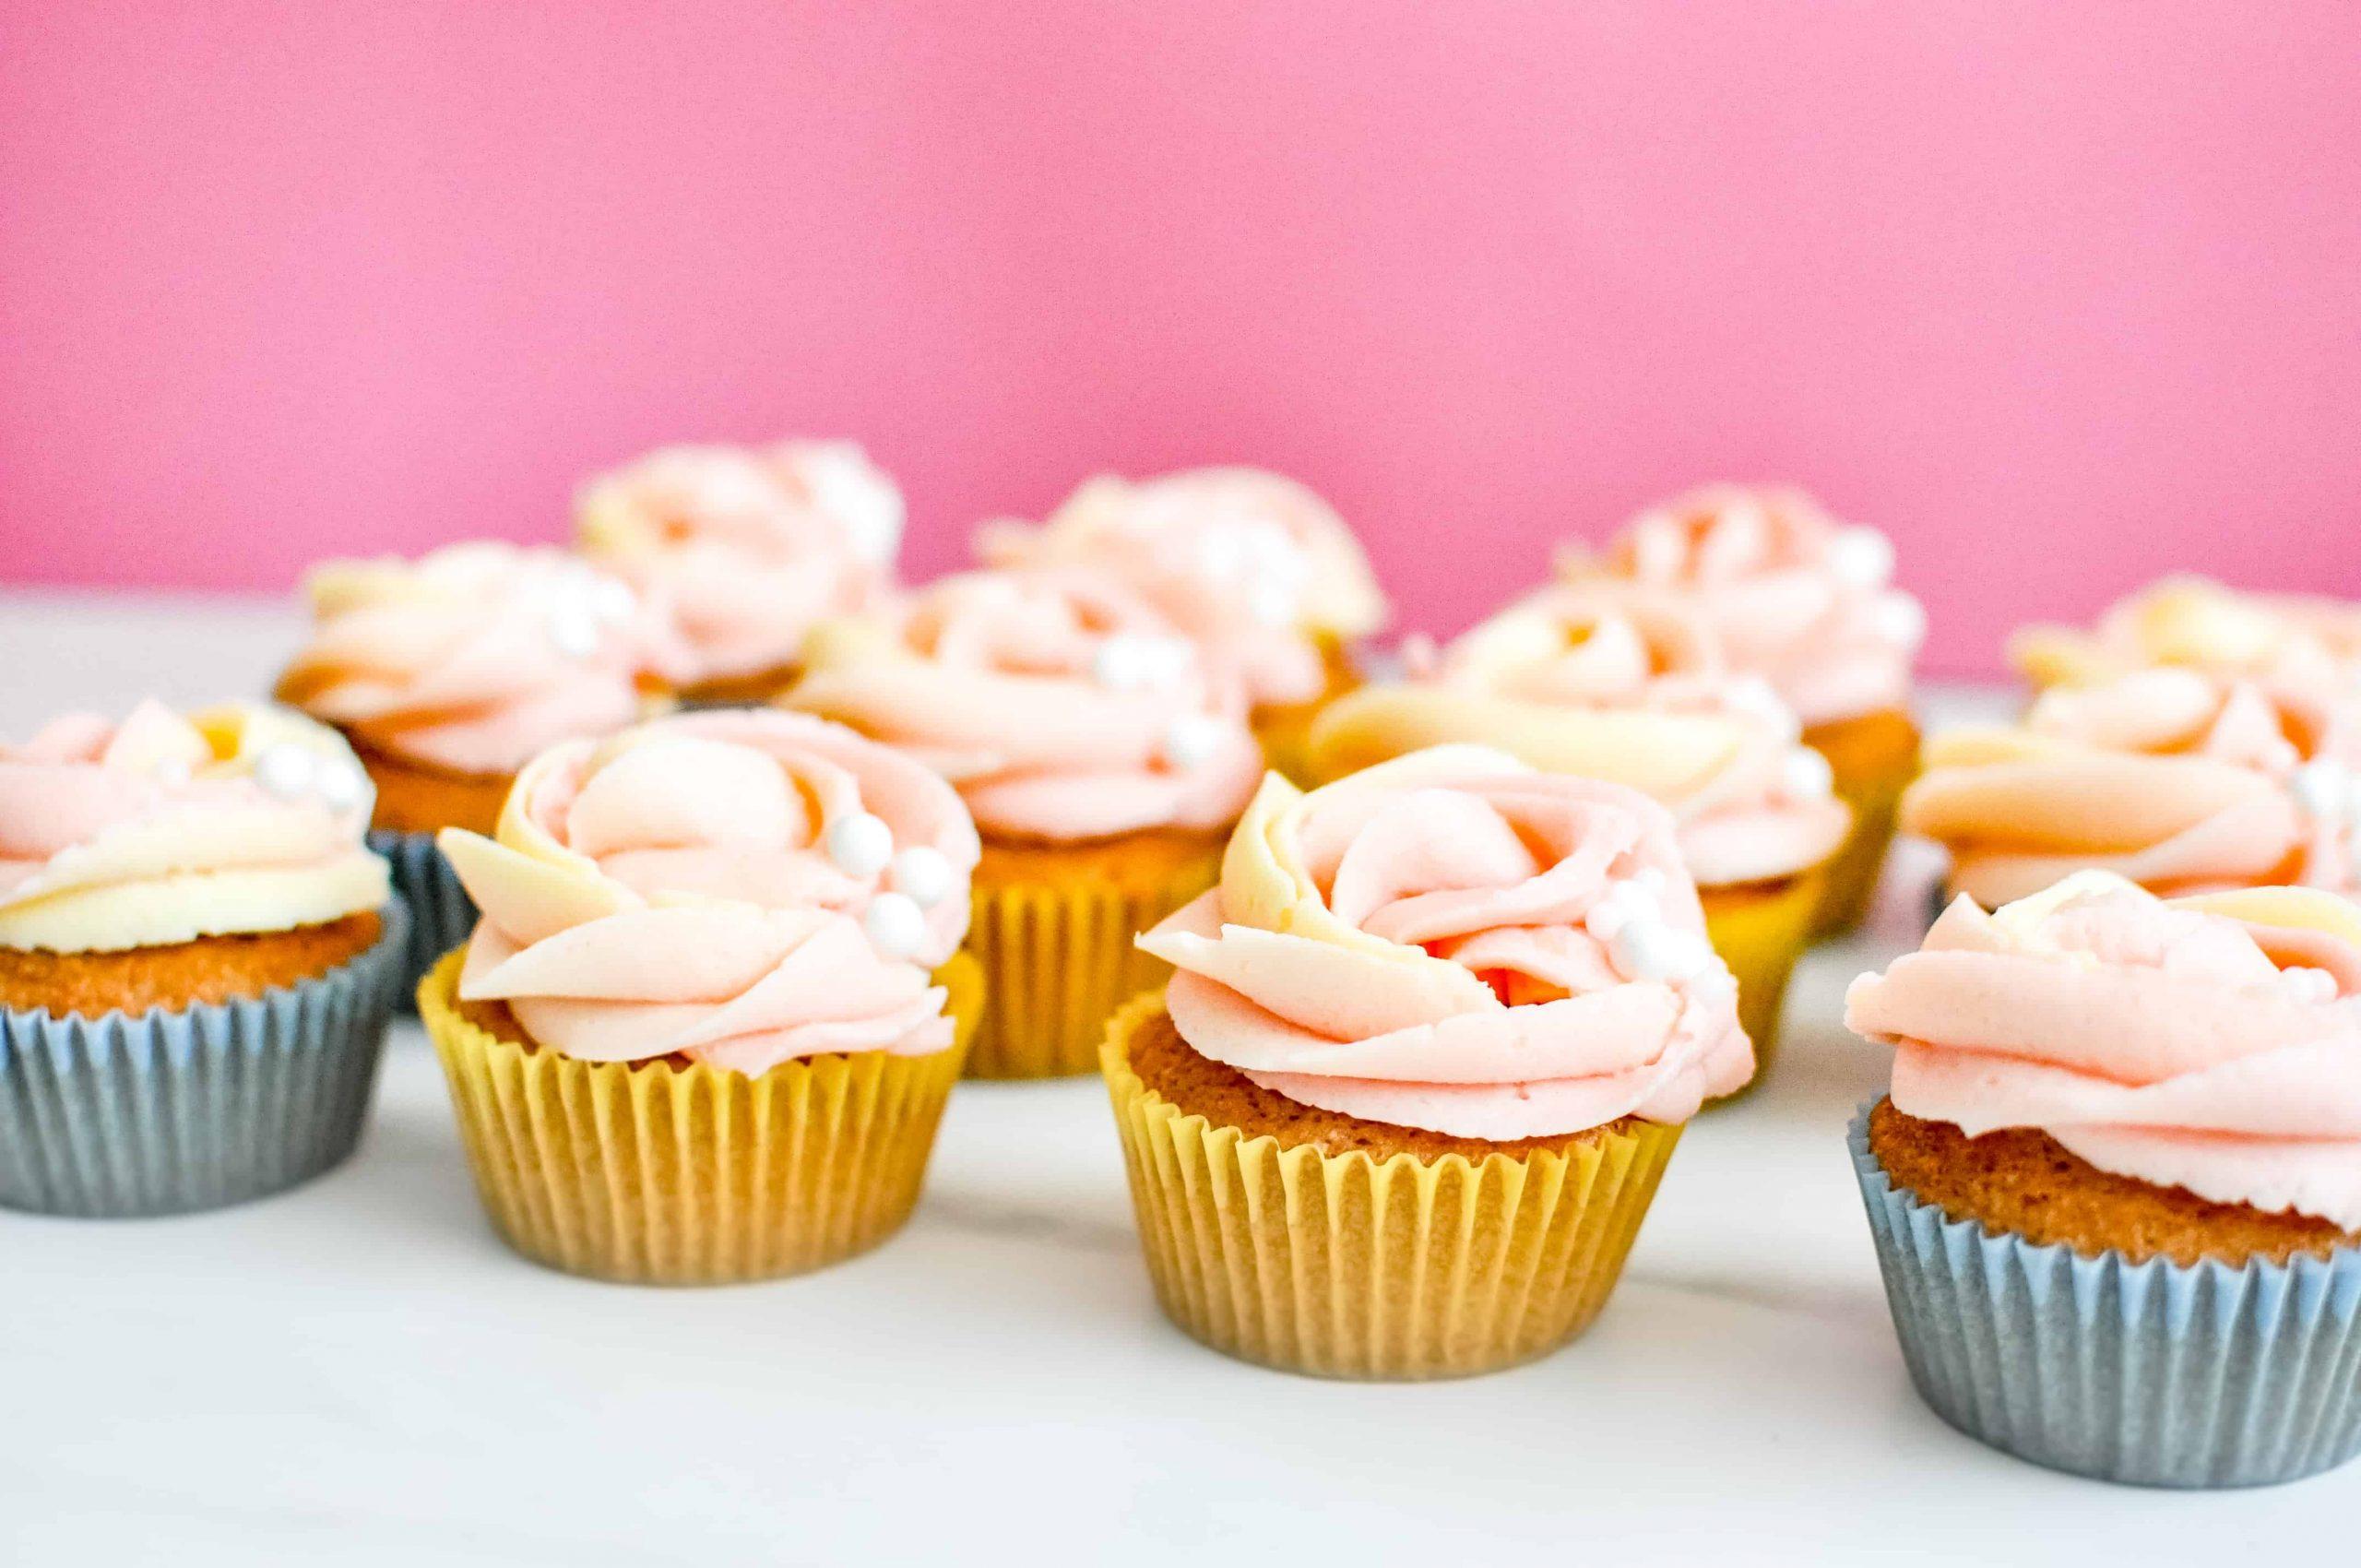 Vanilla Cupcakes Gallery Image